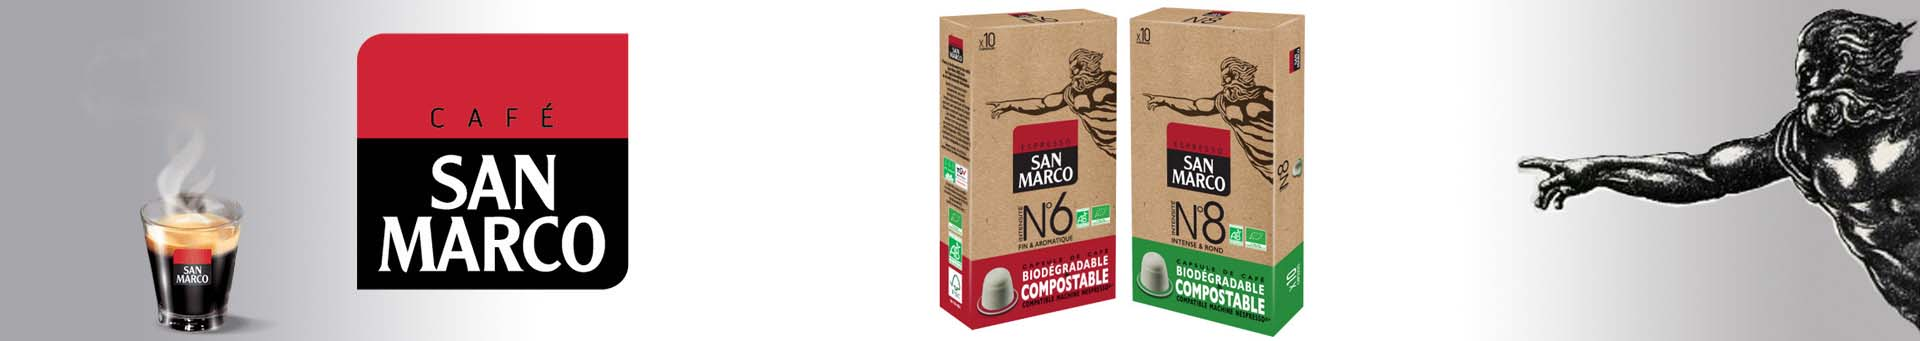 capsule-cafe-nespresso-san-marco-compost